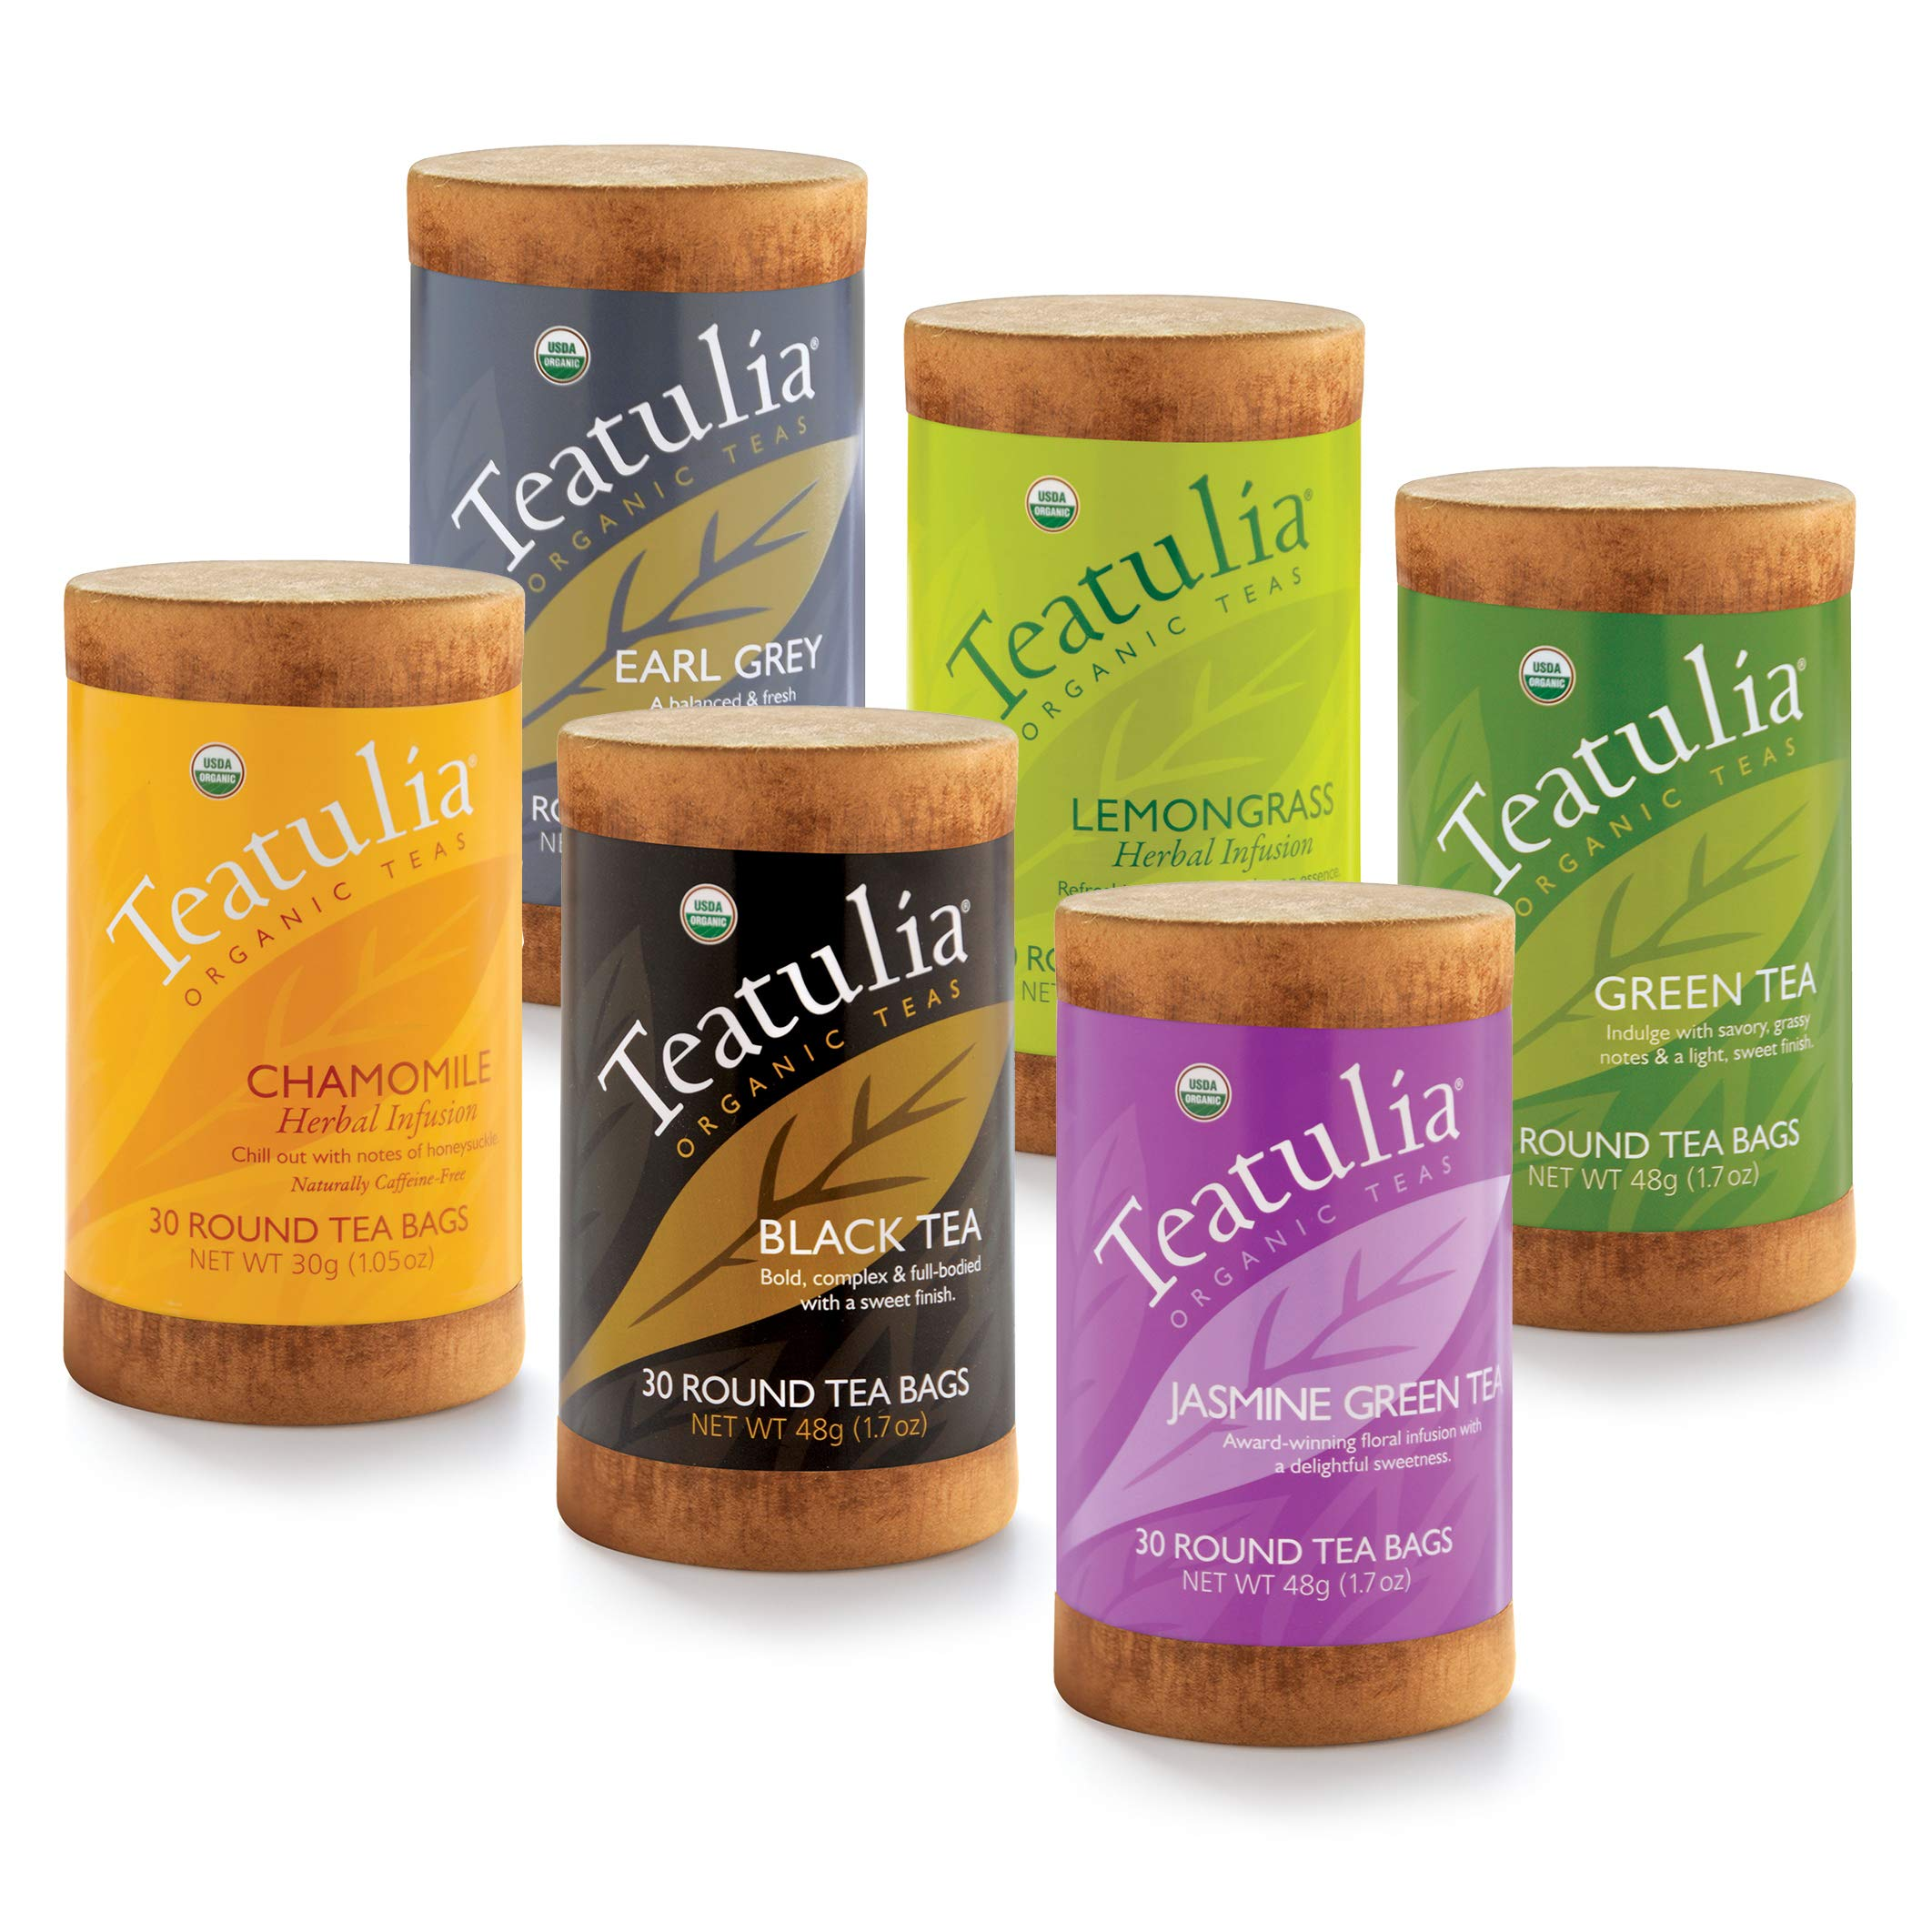 Teatulia Organic Classic Tea Variety Gift Set - 6 Tea Sampler - 180 tea bags by Teatulia